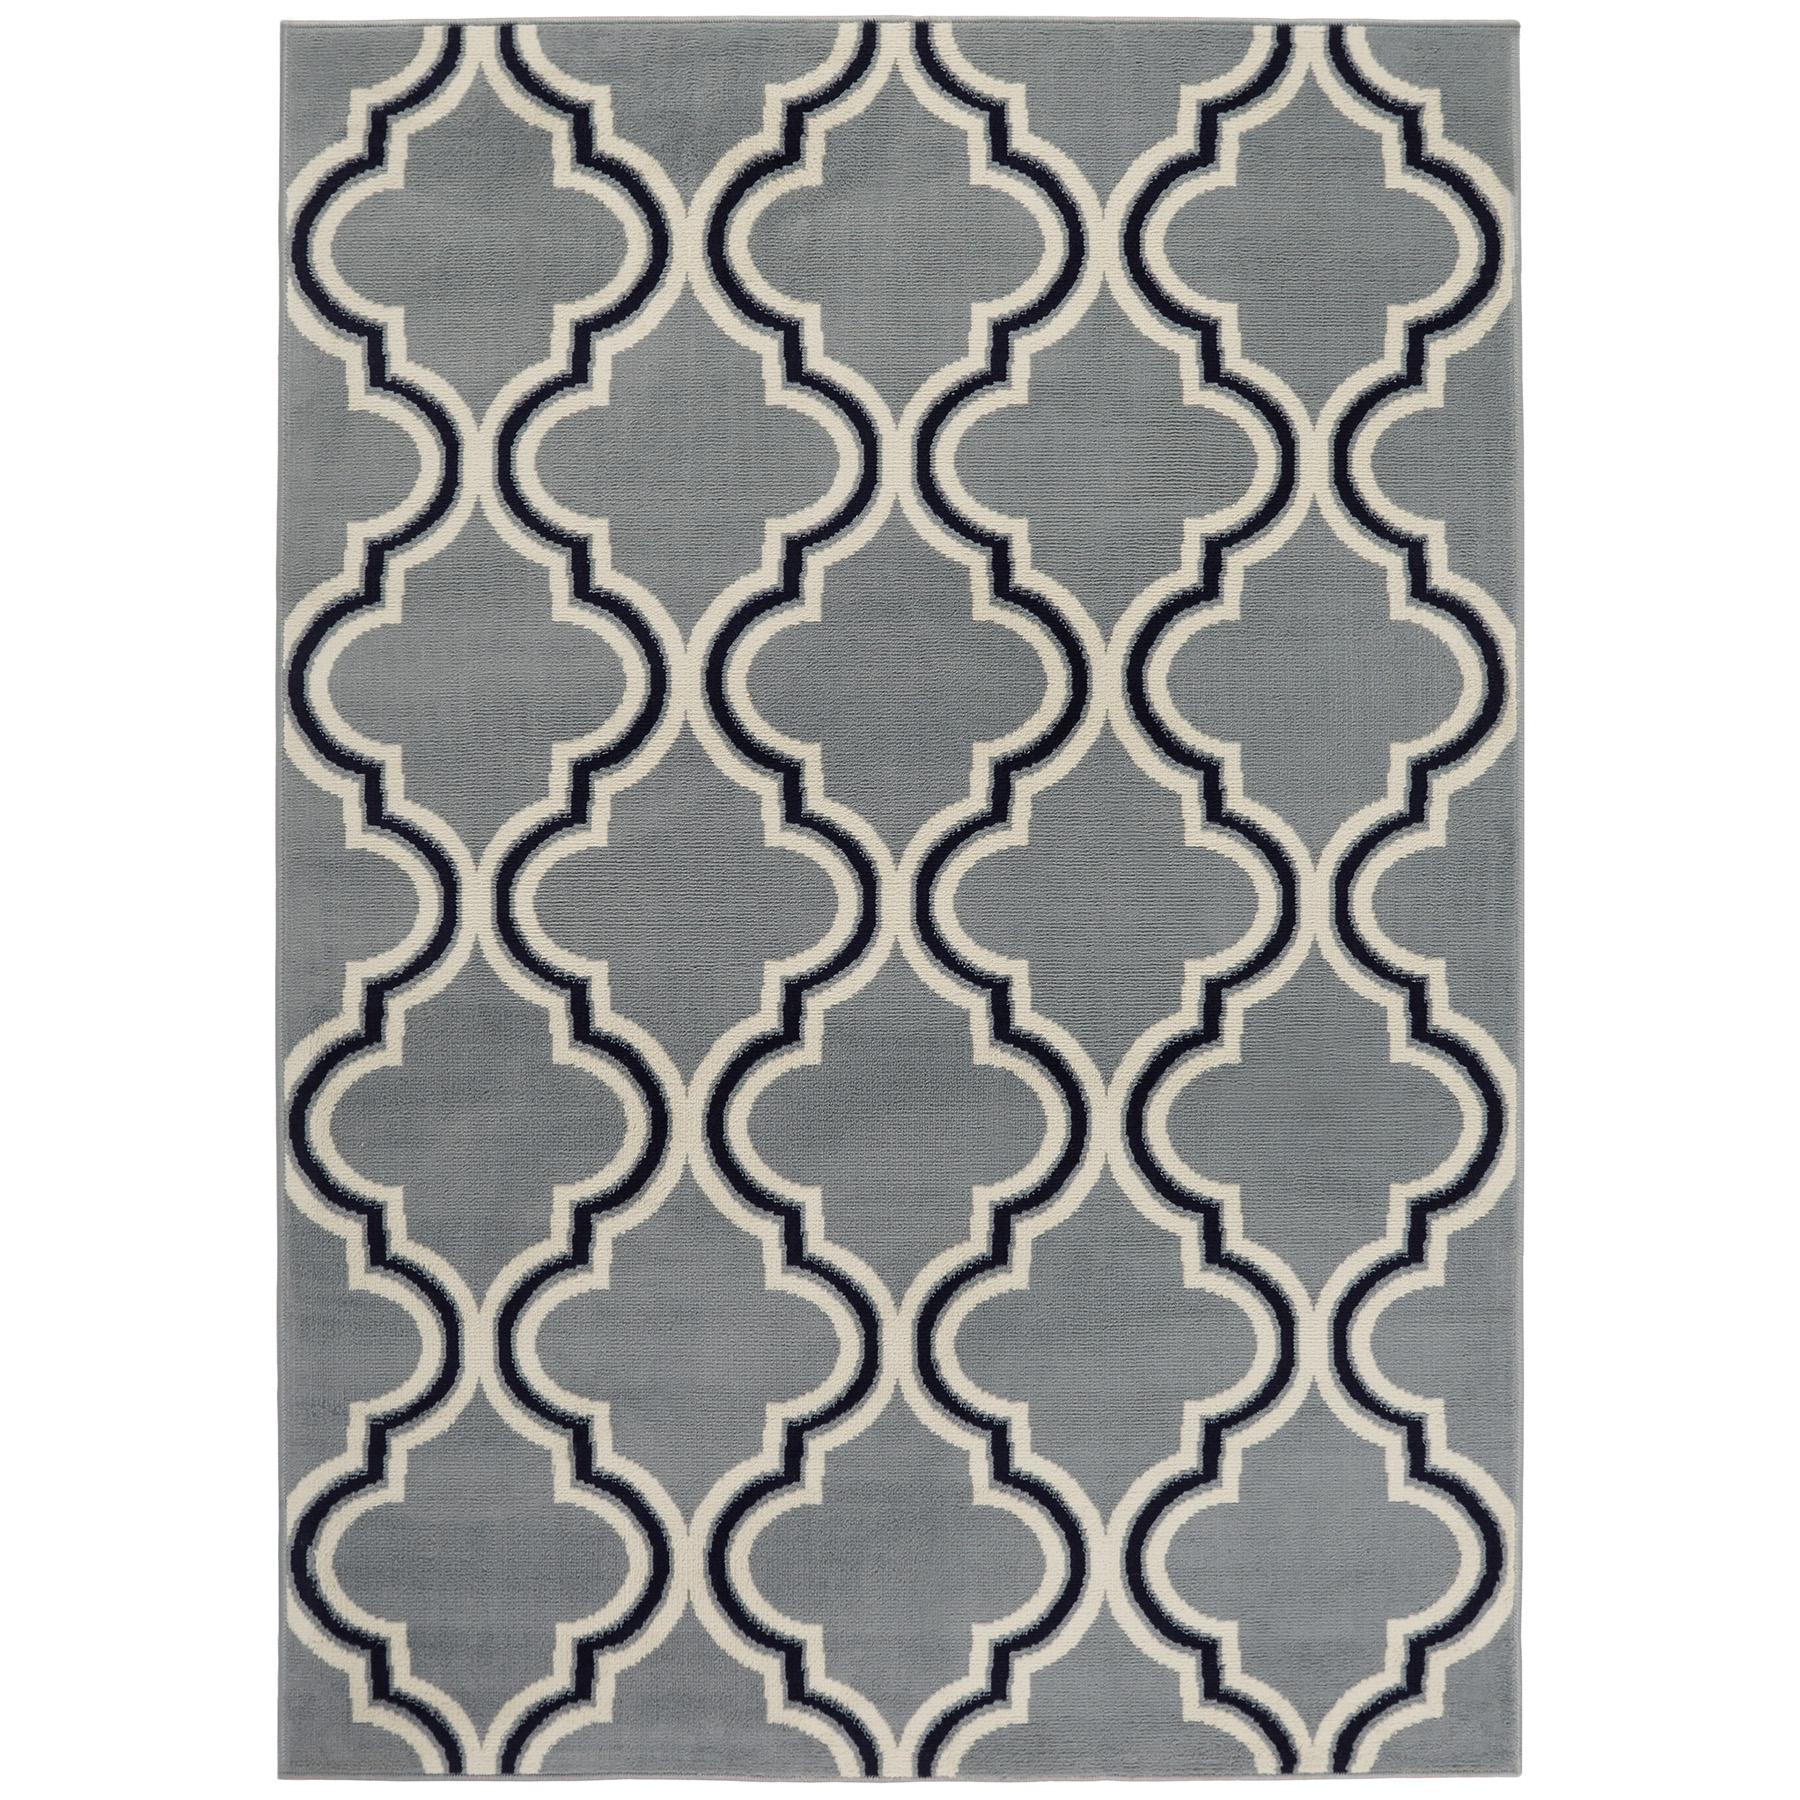 Trellis-Moroccan-Tile-Area-Rug-or-Floral-Lattice-Modern-Carpet-All-Sizes-Colors